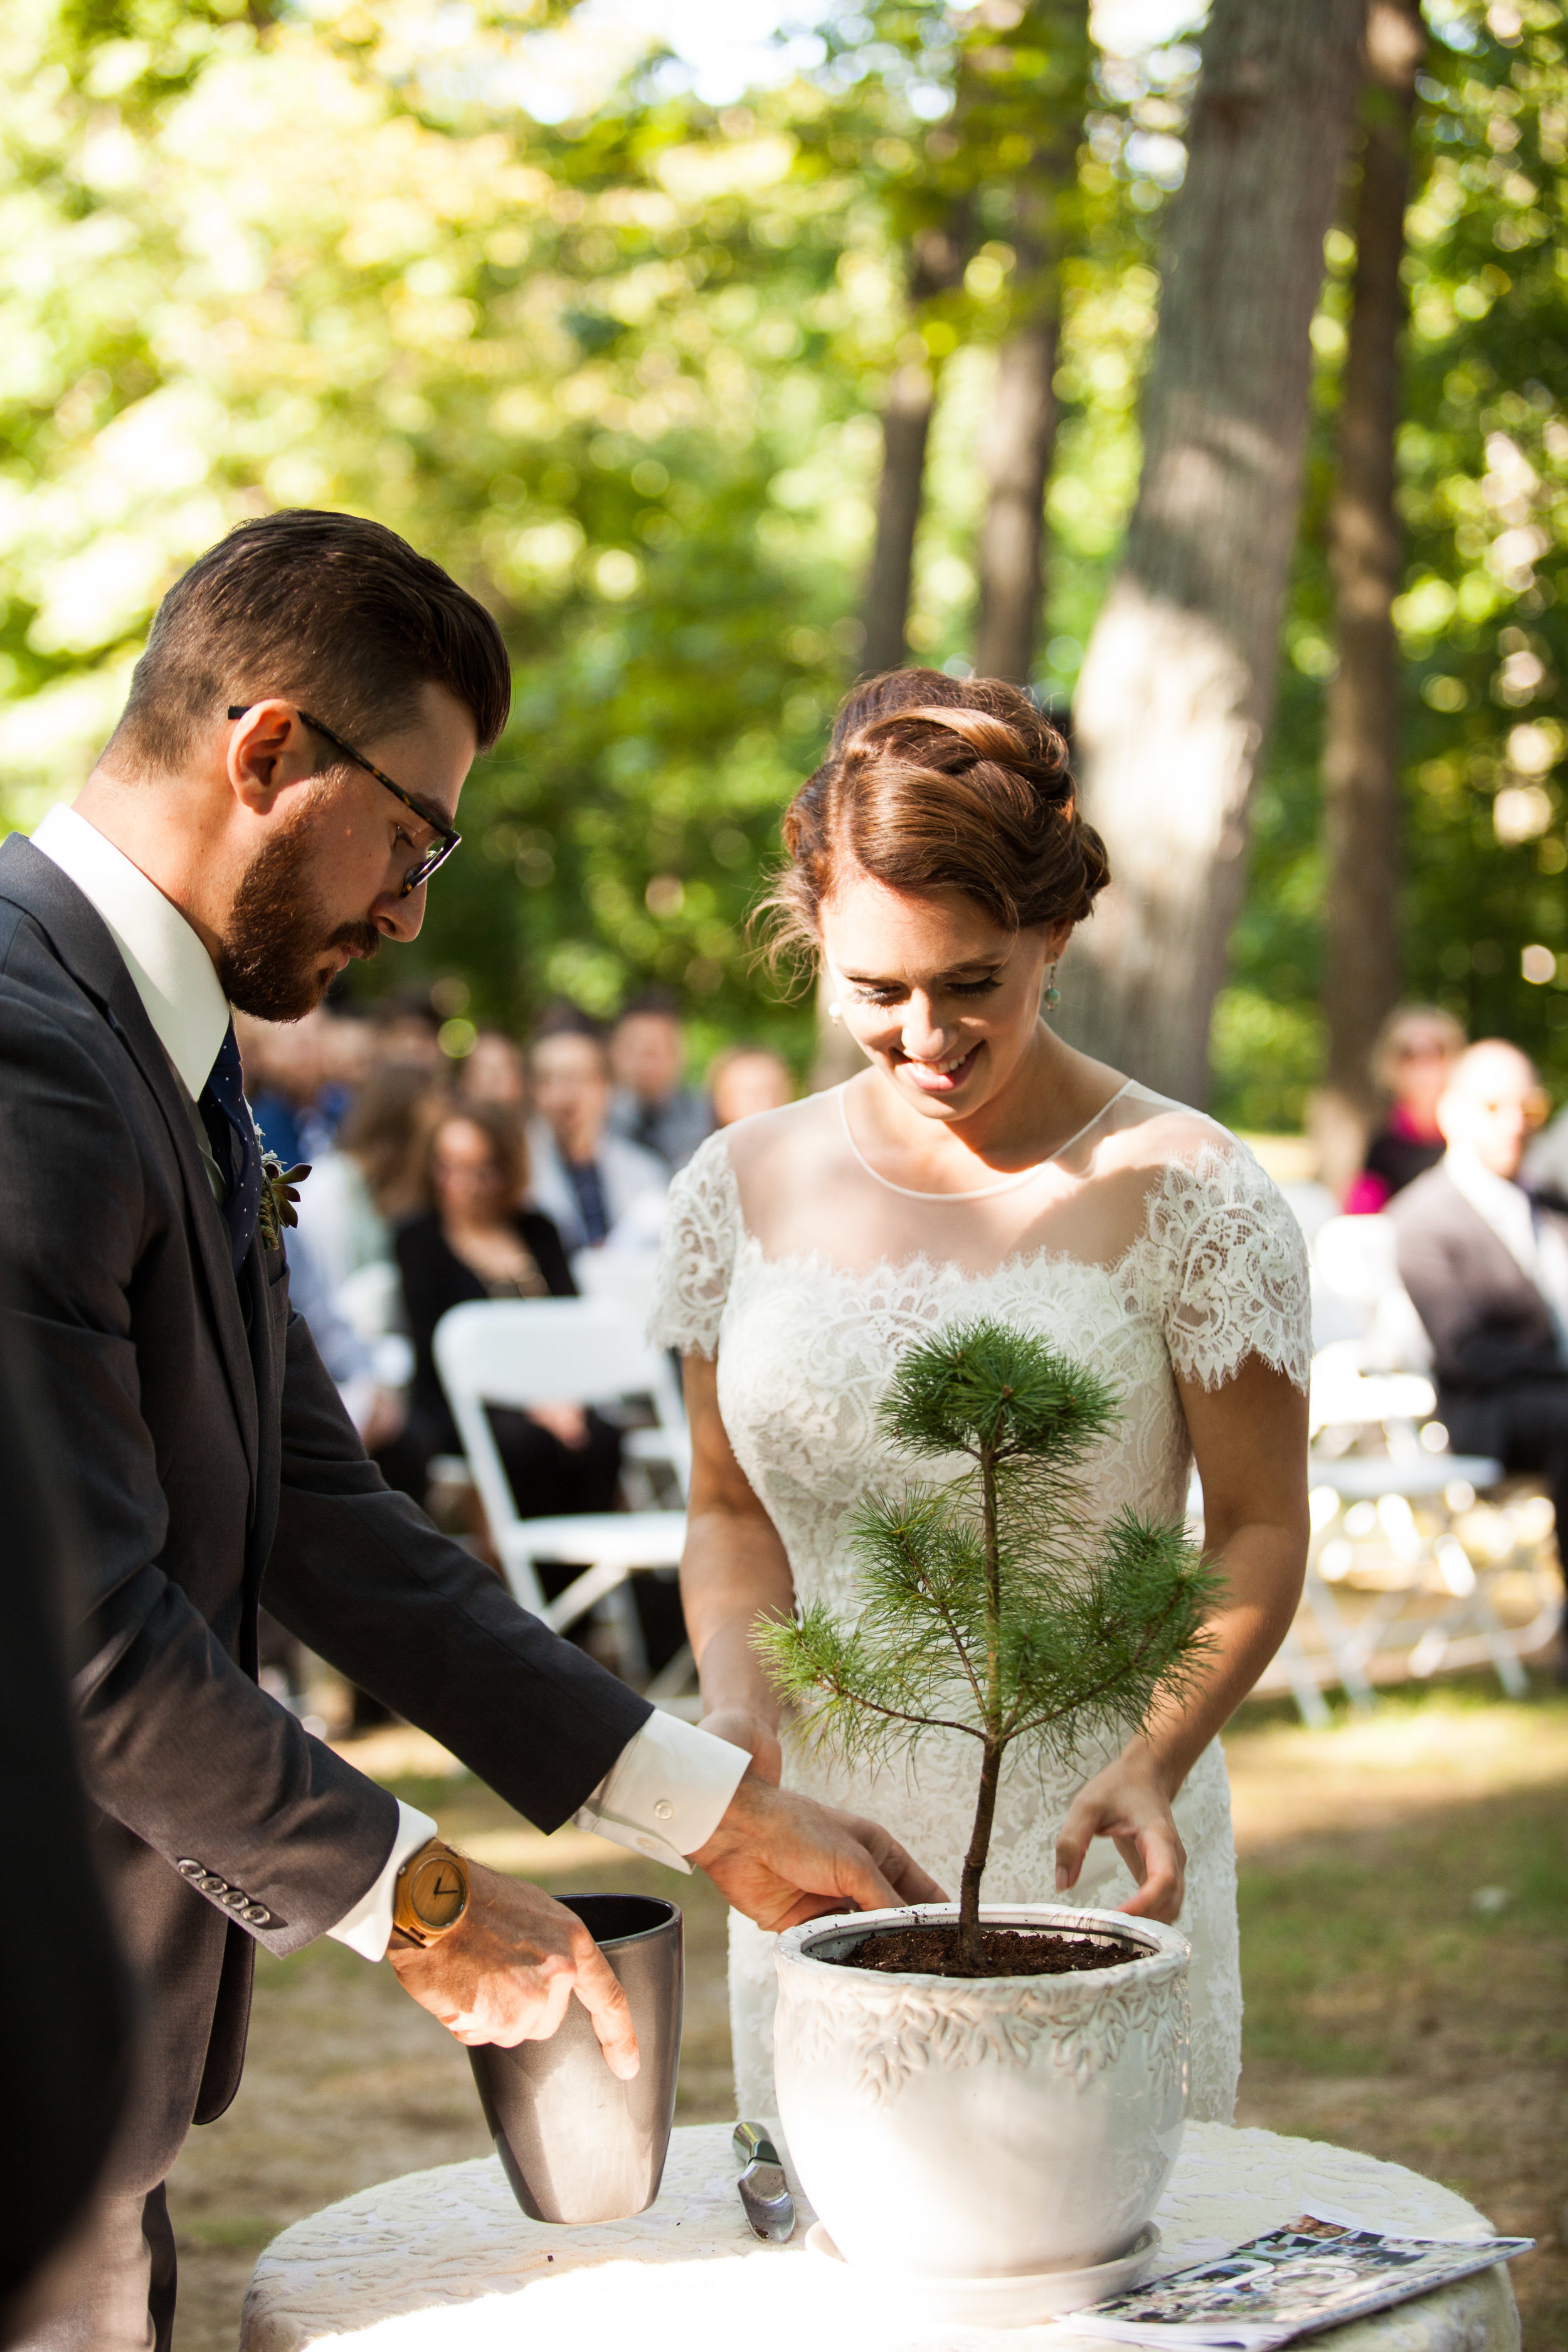 grand_rapids_wedding_rockford_wedding_richard_app_gallery_wedding_grand_rapids_wedding_photographer_summer_wedding_wabasis_lake_park_wedding_rustic_wedding-47.jpg